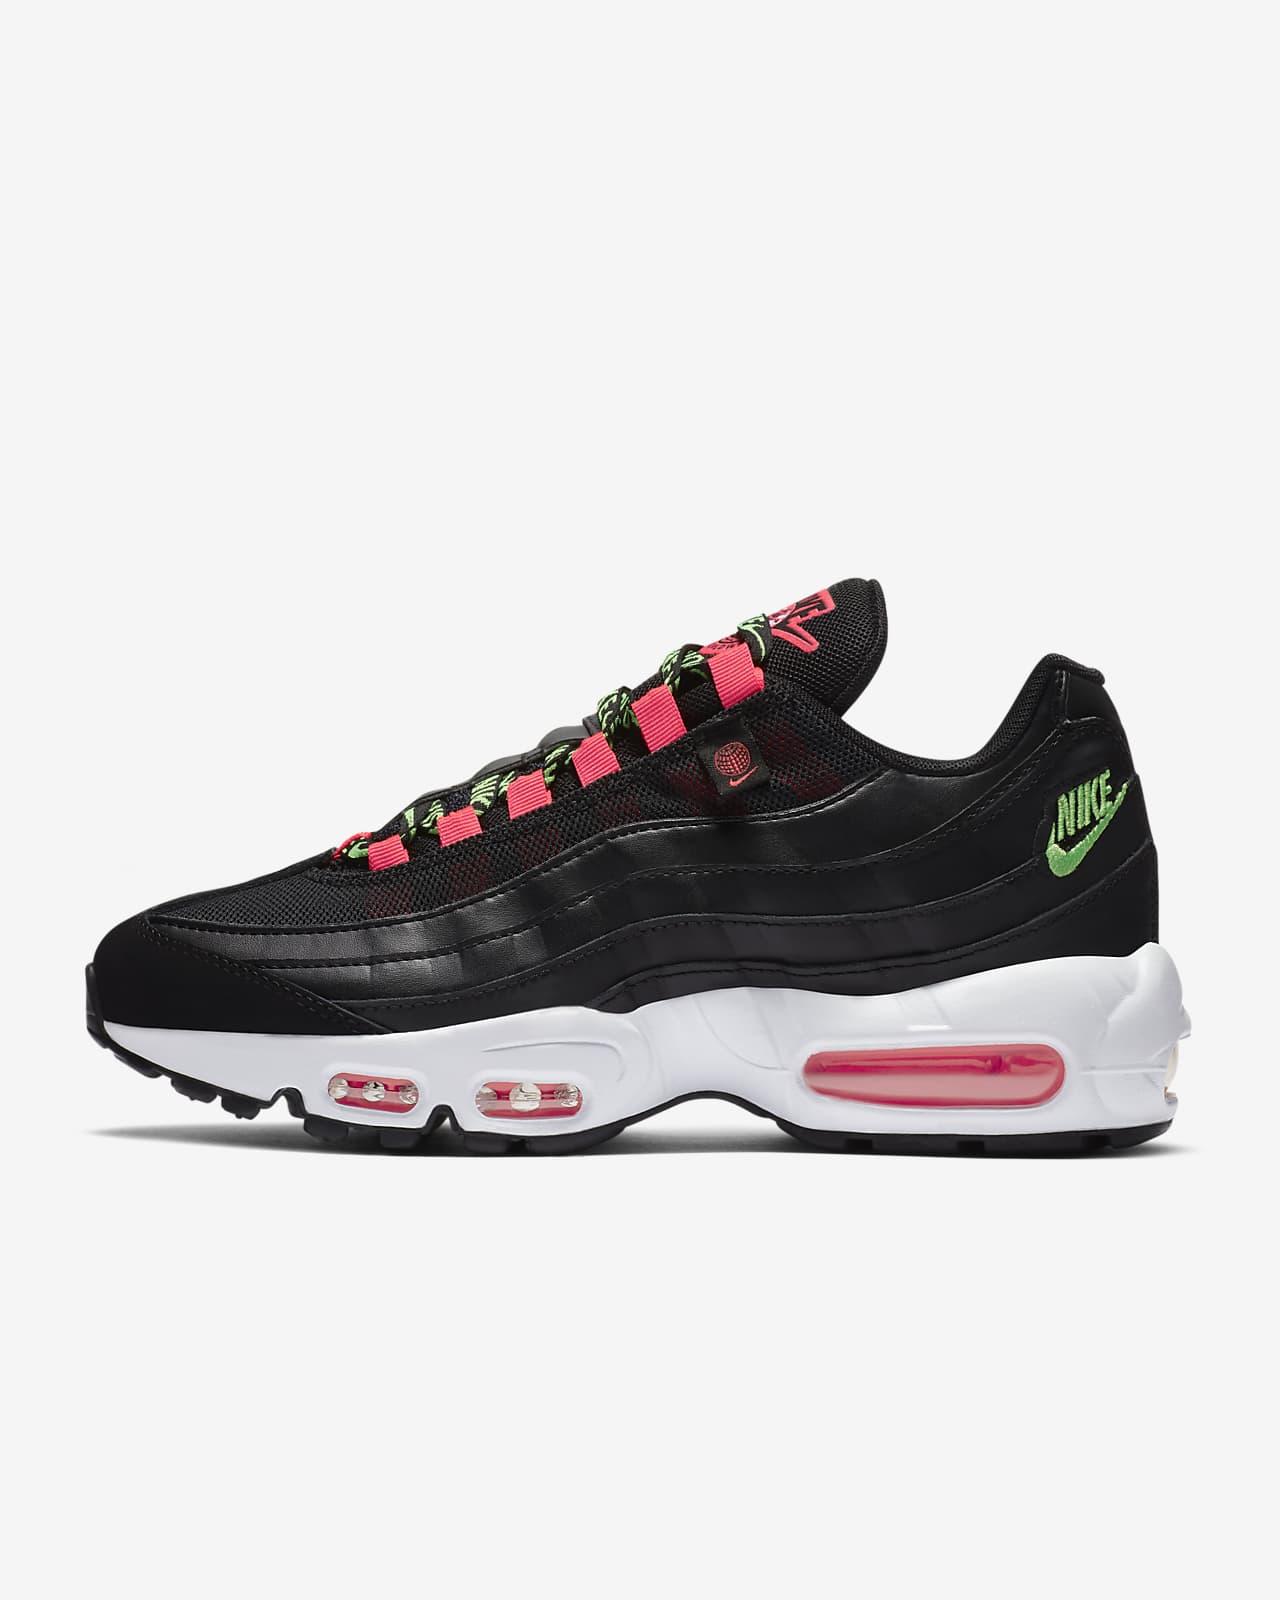 Nike Air Max 95 SE Women's Shoes